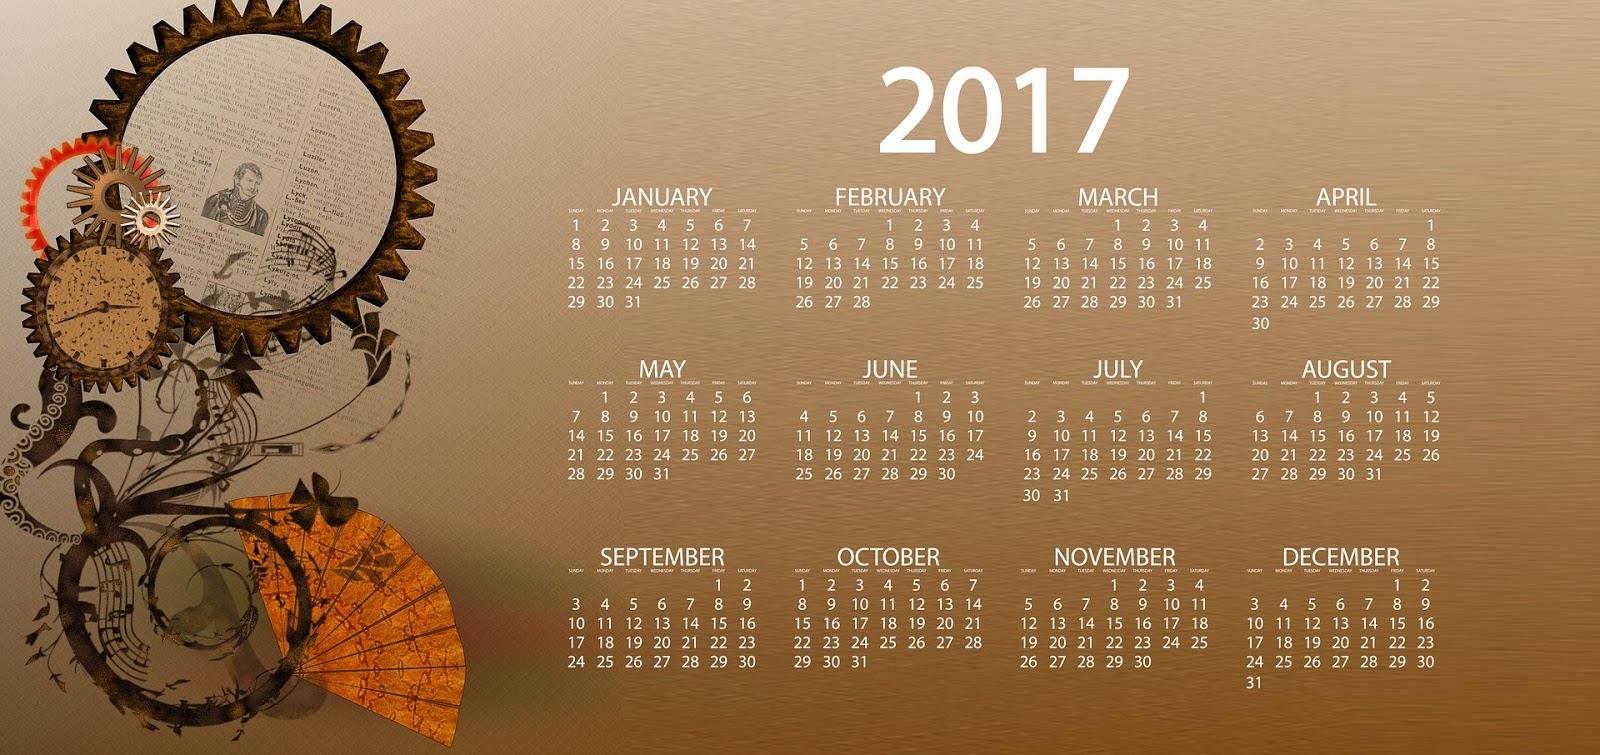 Chinese New Year 2017 Dates